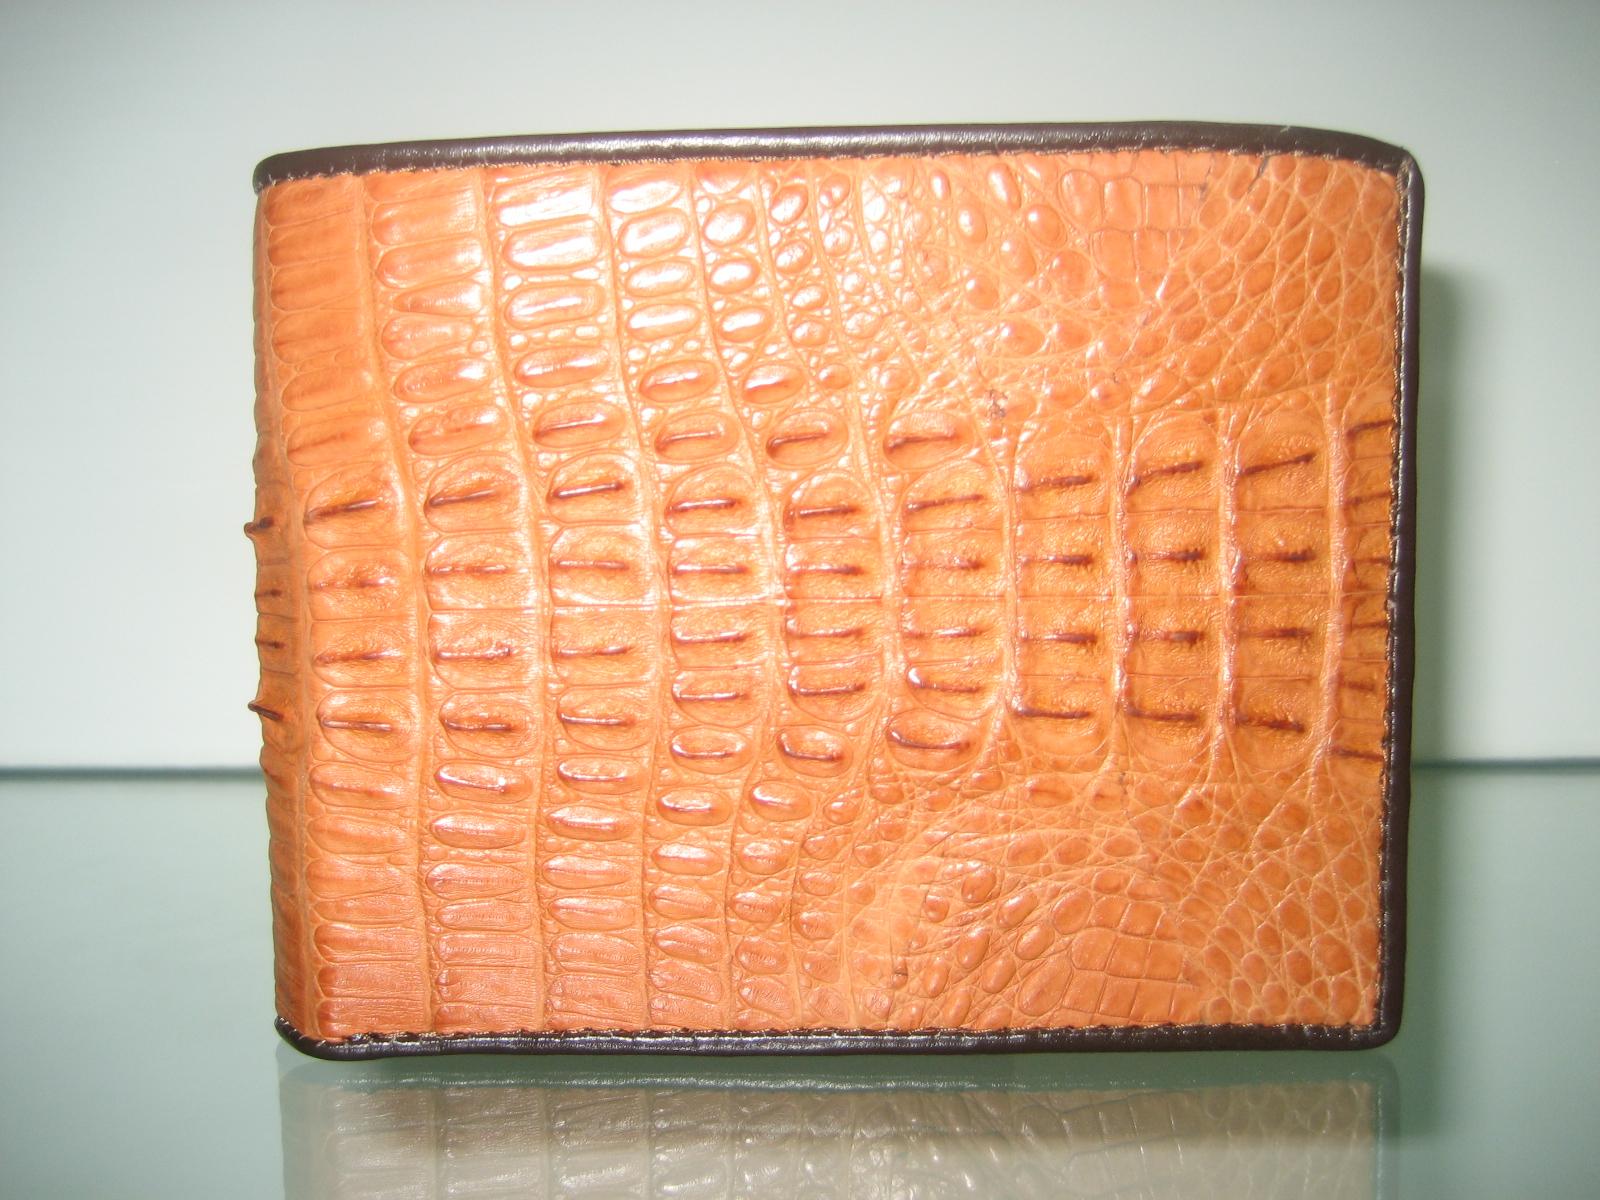 Genuine Crocodile/Alligator Leather Wallet in Light Brown (Tan) Crocodile Leather #CRM443W-06